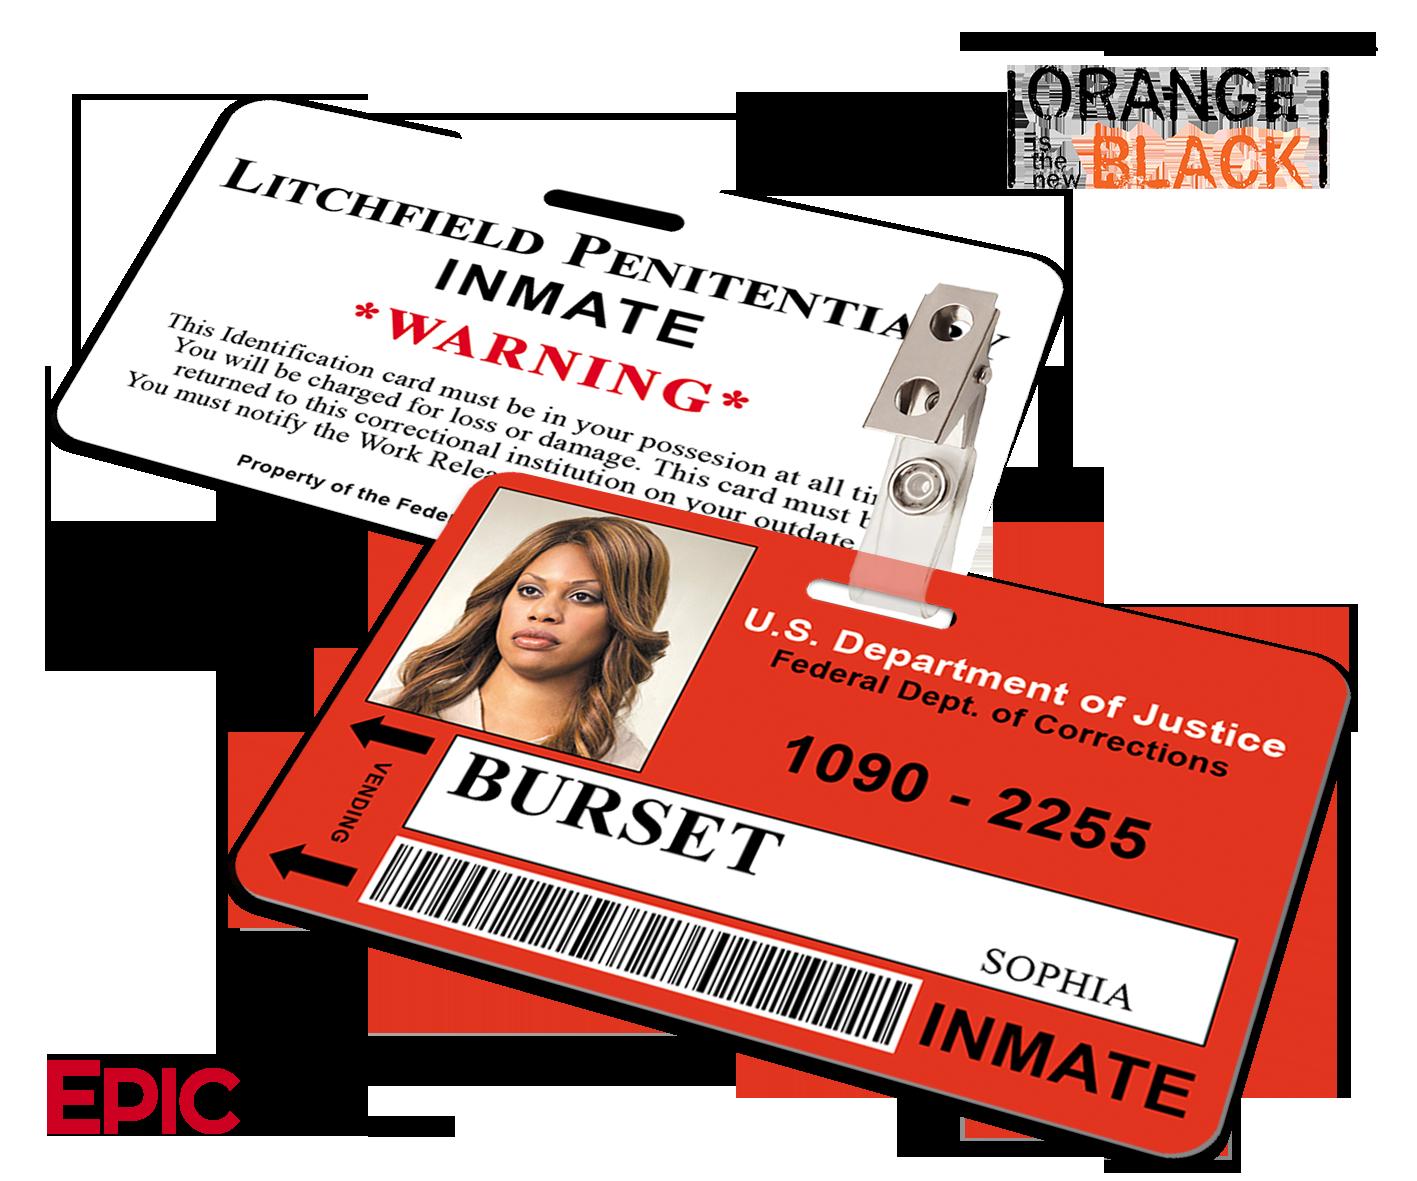 Orange is the New Black Inspired Inmate ID Card - Burset, Sophia